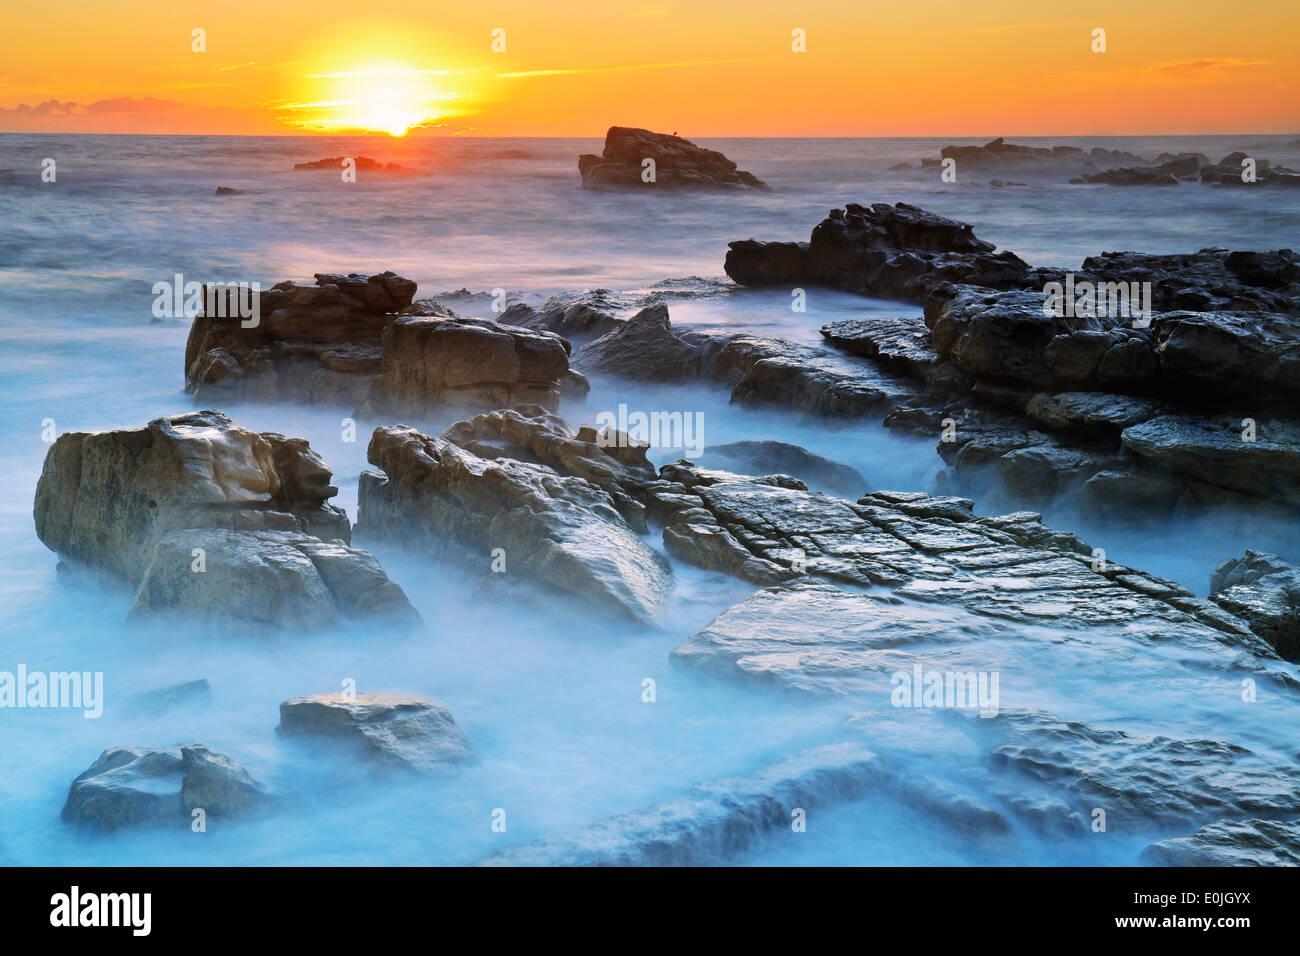 Sonnenuntergang auf Bird Island, Lamberts Bay, Western Cape, Westkap, Suedafrika, Afrika - Stock Image